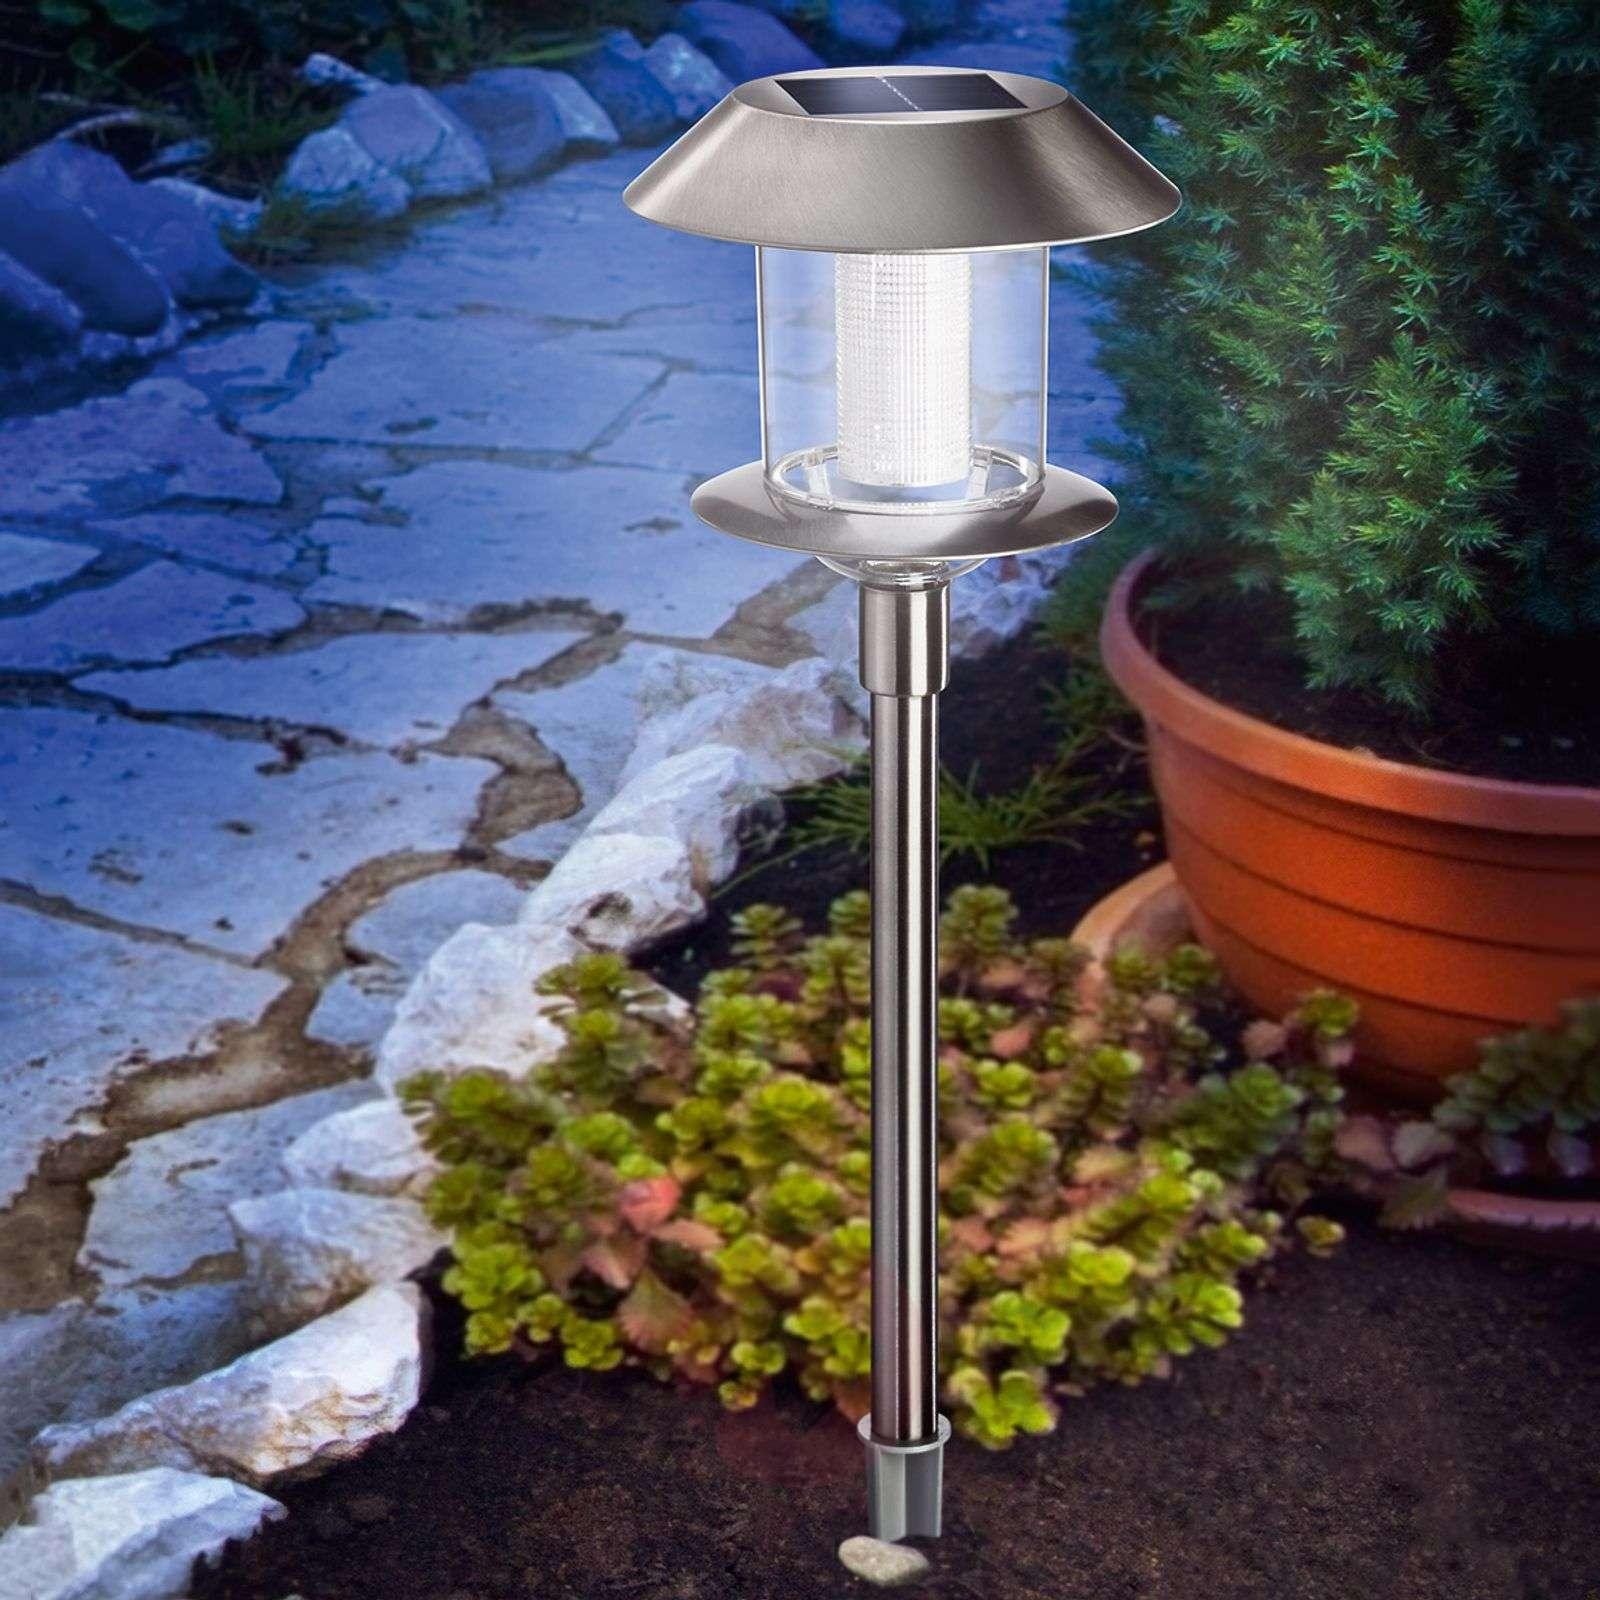 Swing Duo Solar stainless steel solar light-3012004-01